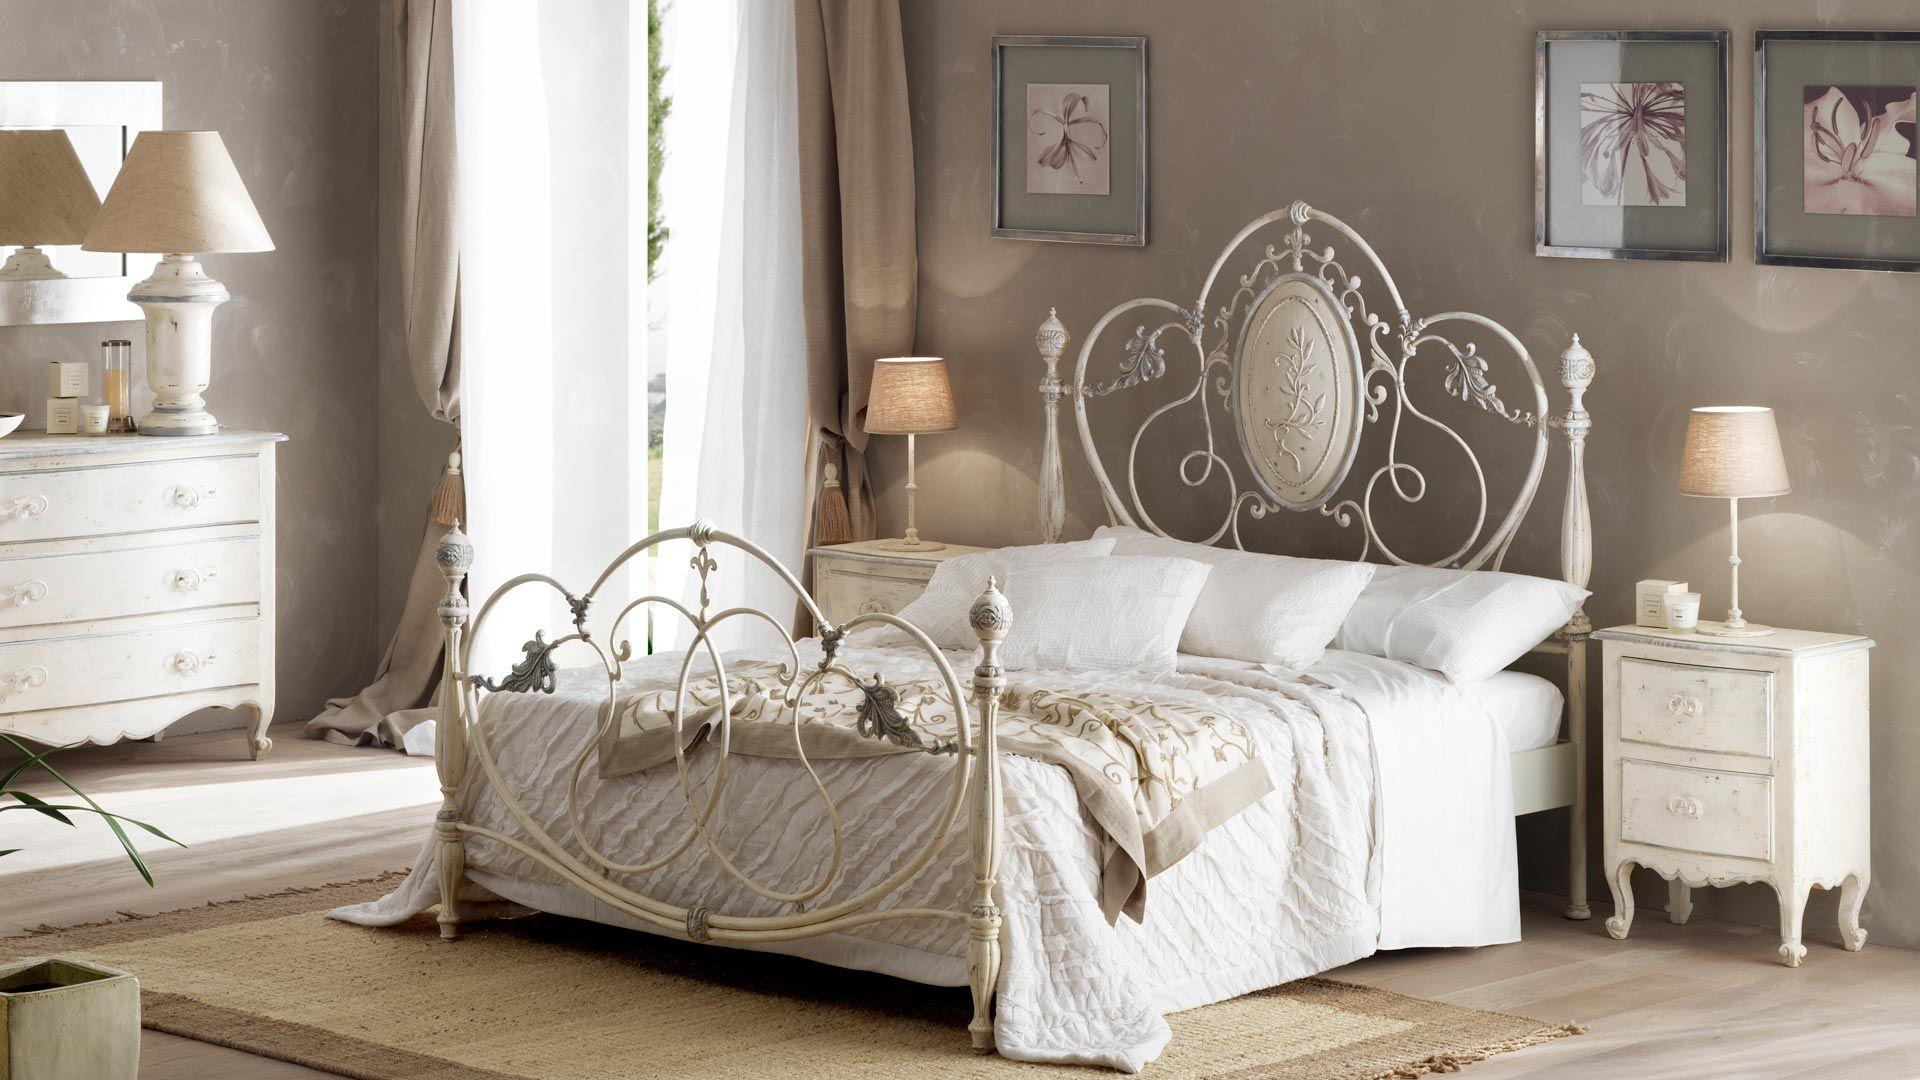 bedroom - Cantori | casa idee | Pinterest | Idee